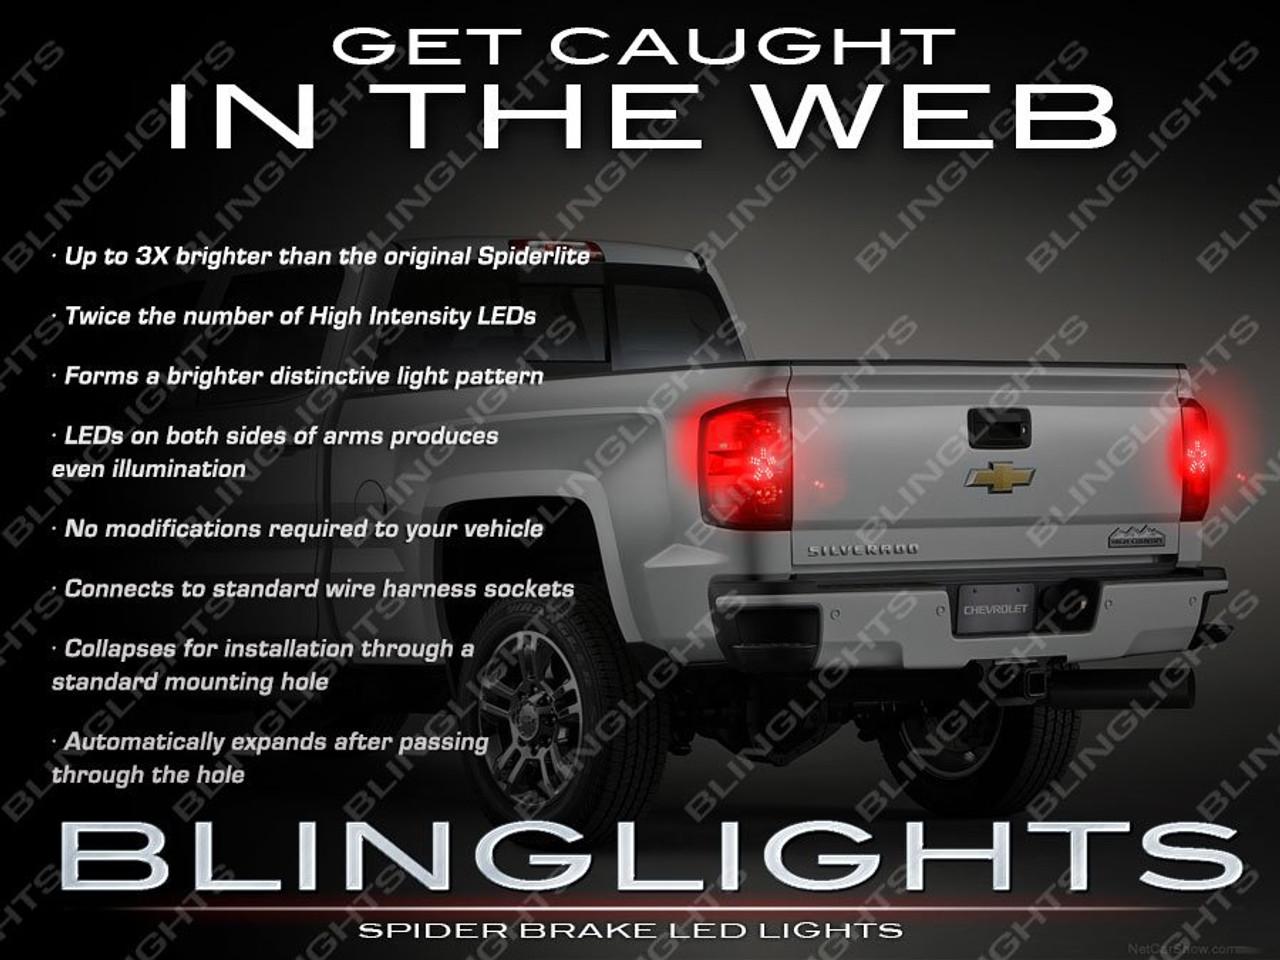 Dodge Neon 2.0 2.0L SOHC ECH A588 Intake Valves Set//8 2001-2004 3-keeper slots